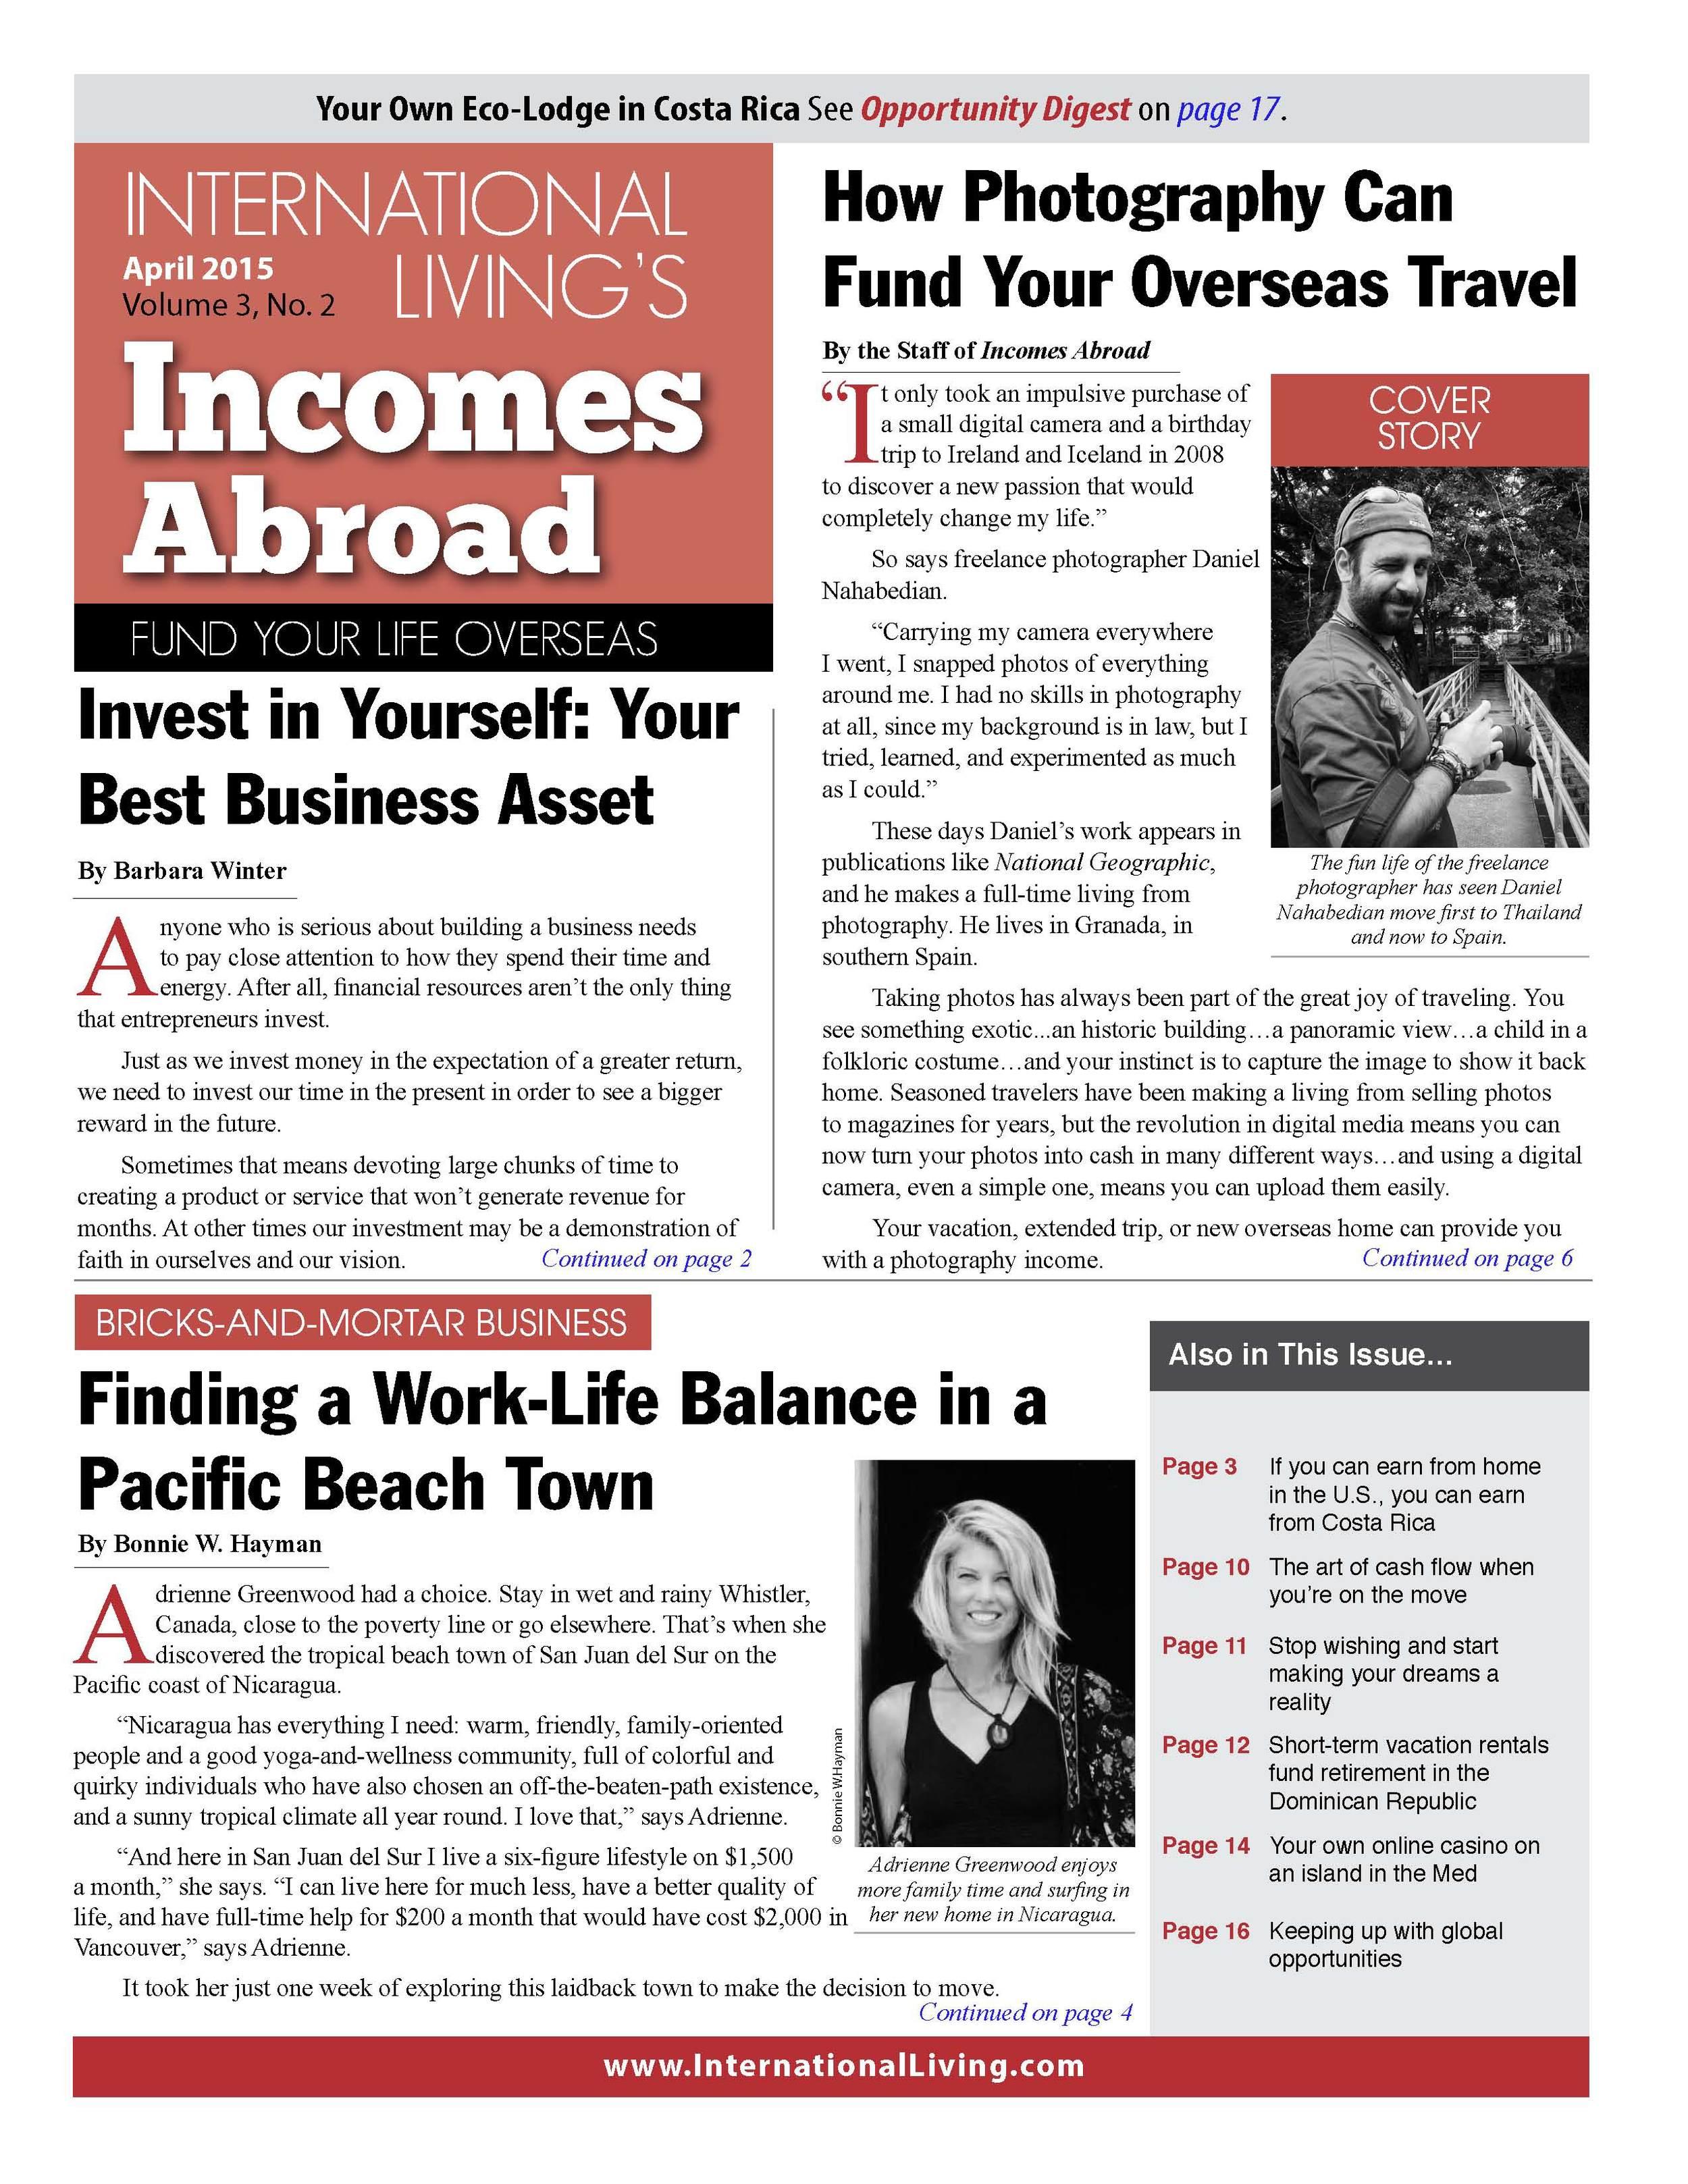 Incomes-Abroad_April2015.jpg